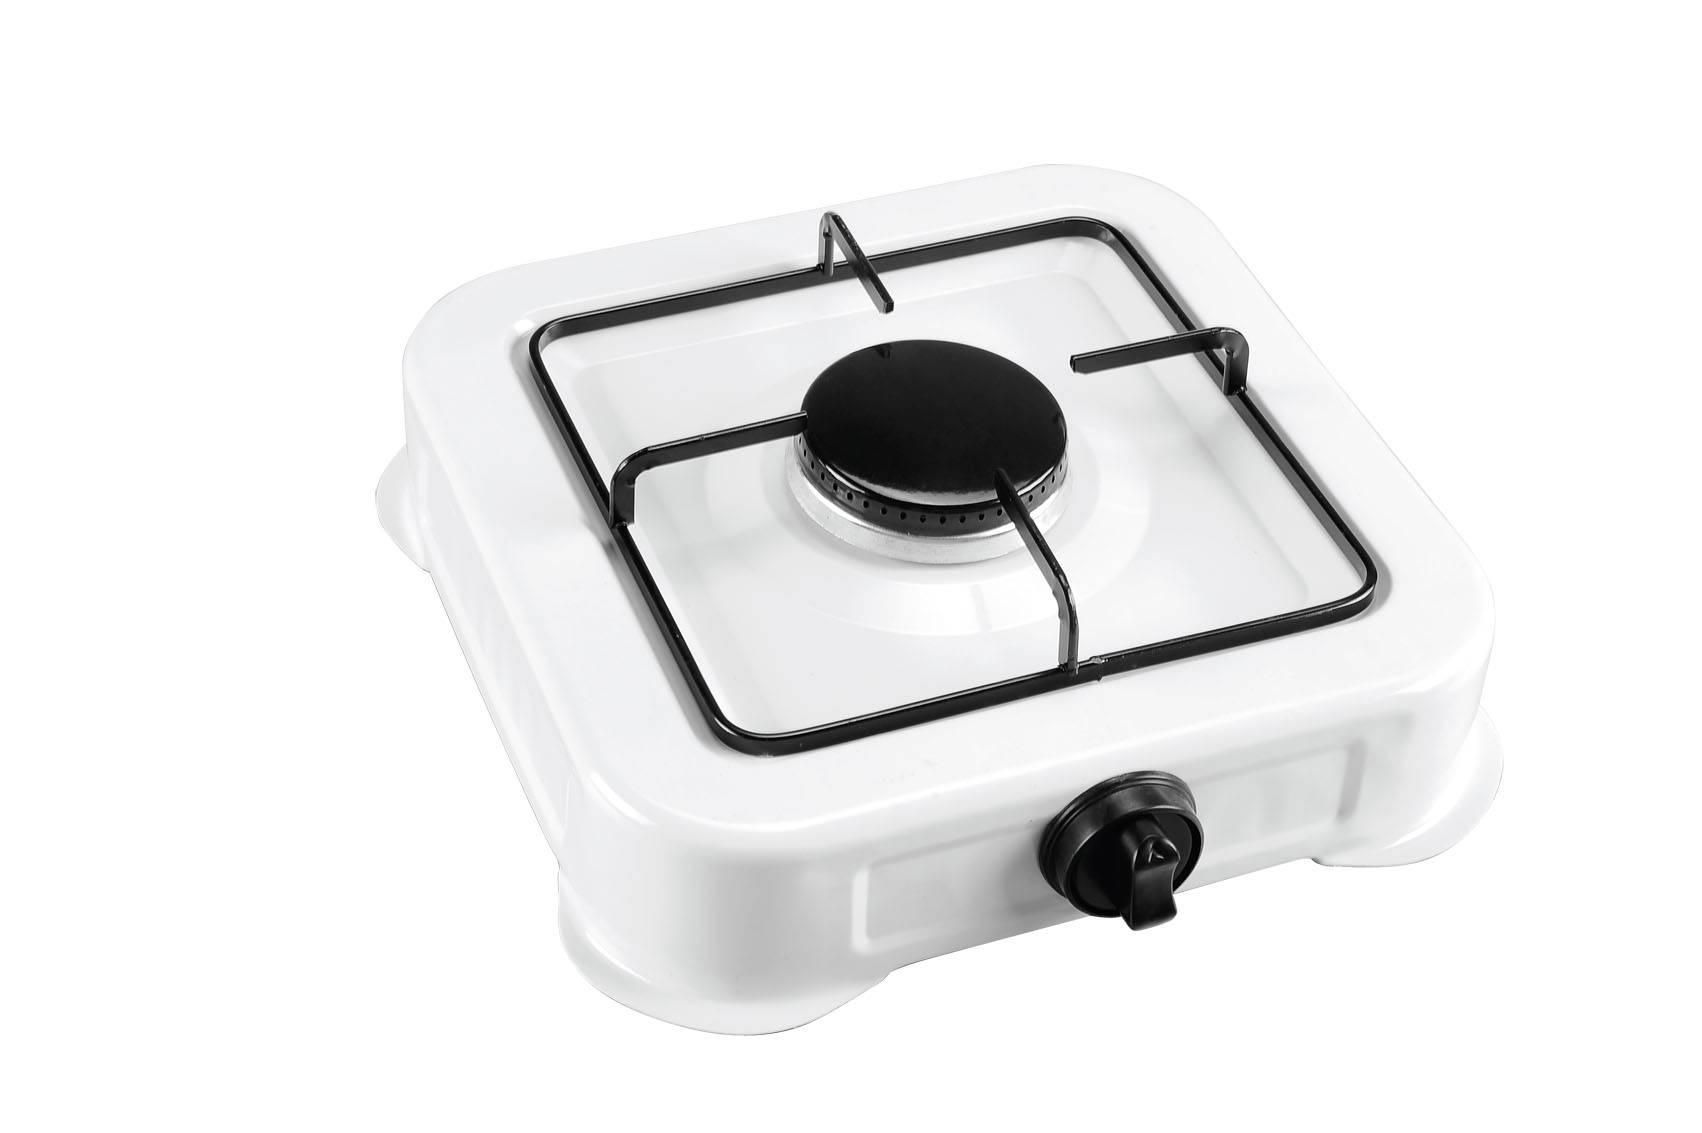 simple gas stove 1 burner